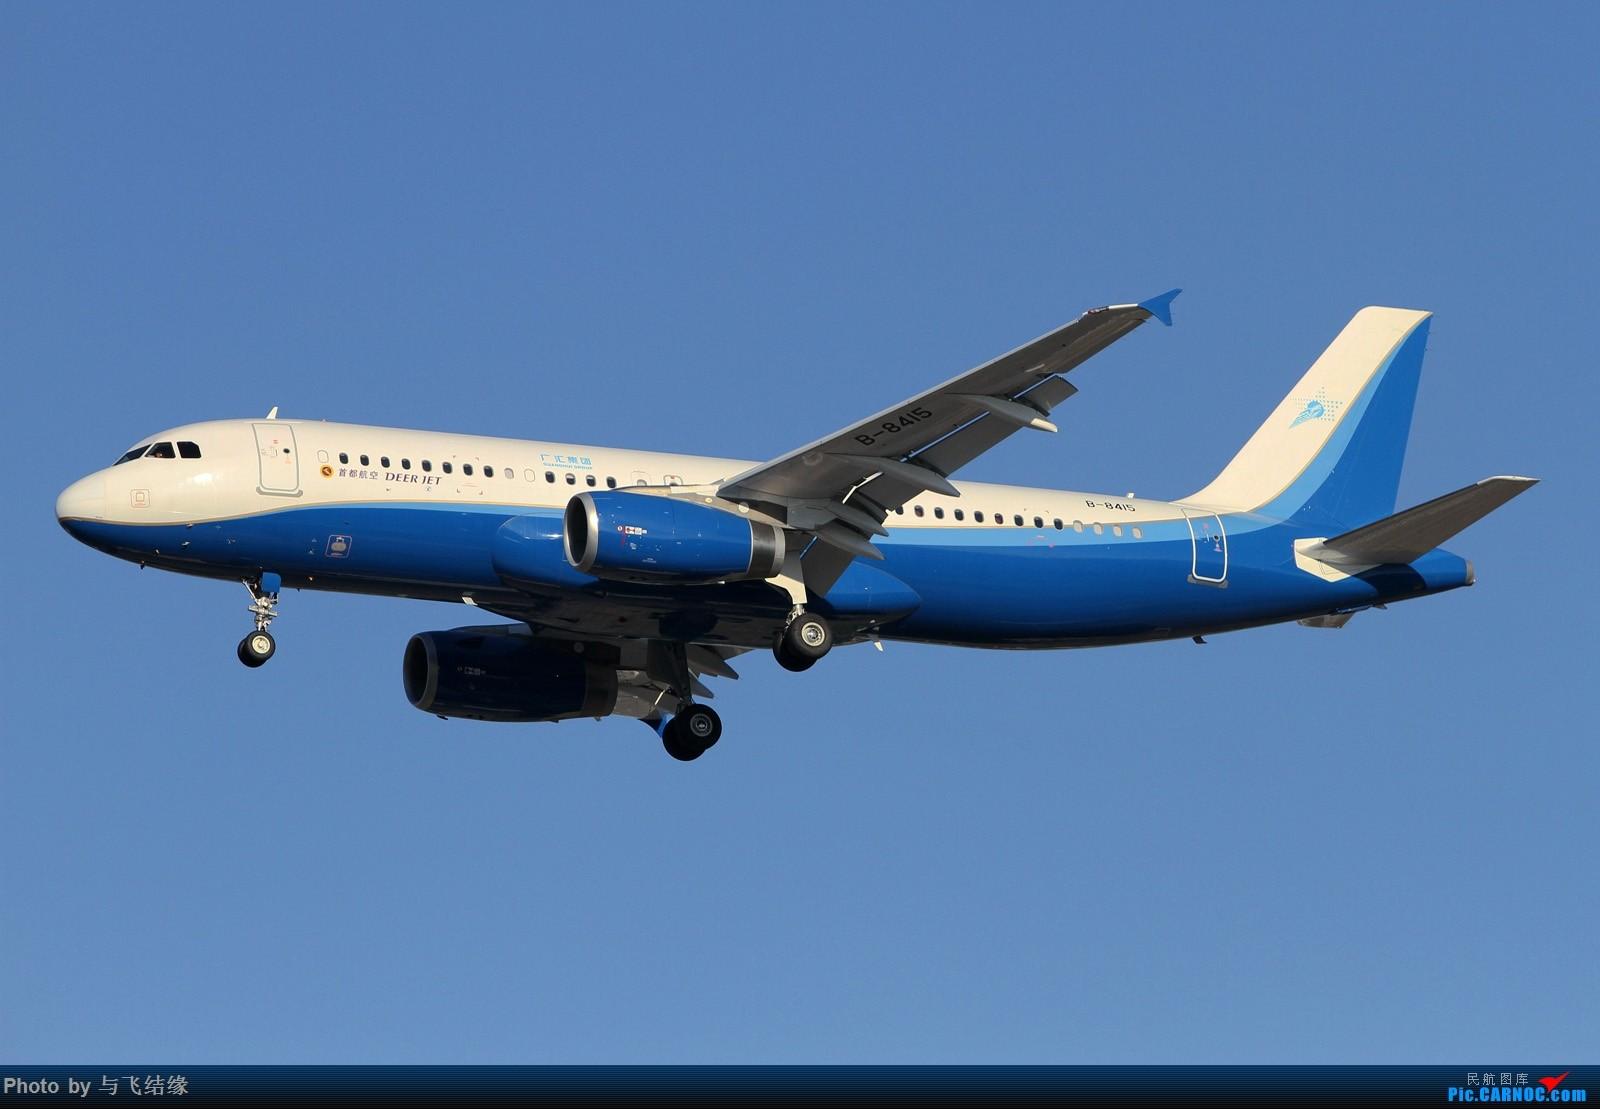 "Re:[原创]山东航空最新波音737-800彩绘机""好客山东—景芝号""及其其它的一些一些! AIRBUS A320-200 B-8415 中国北京首都国际机场"